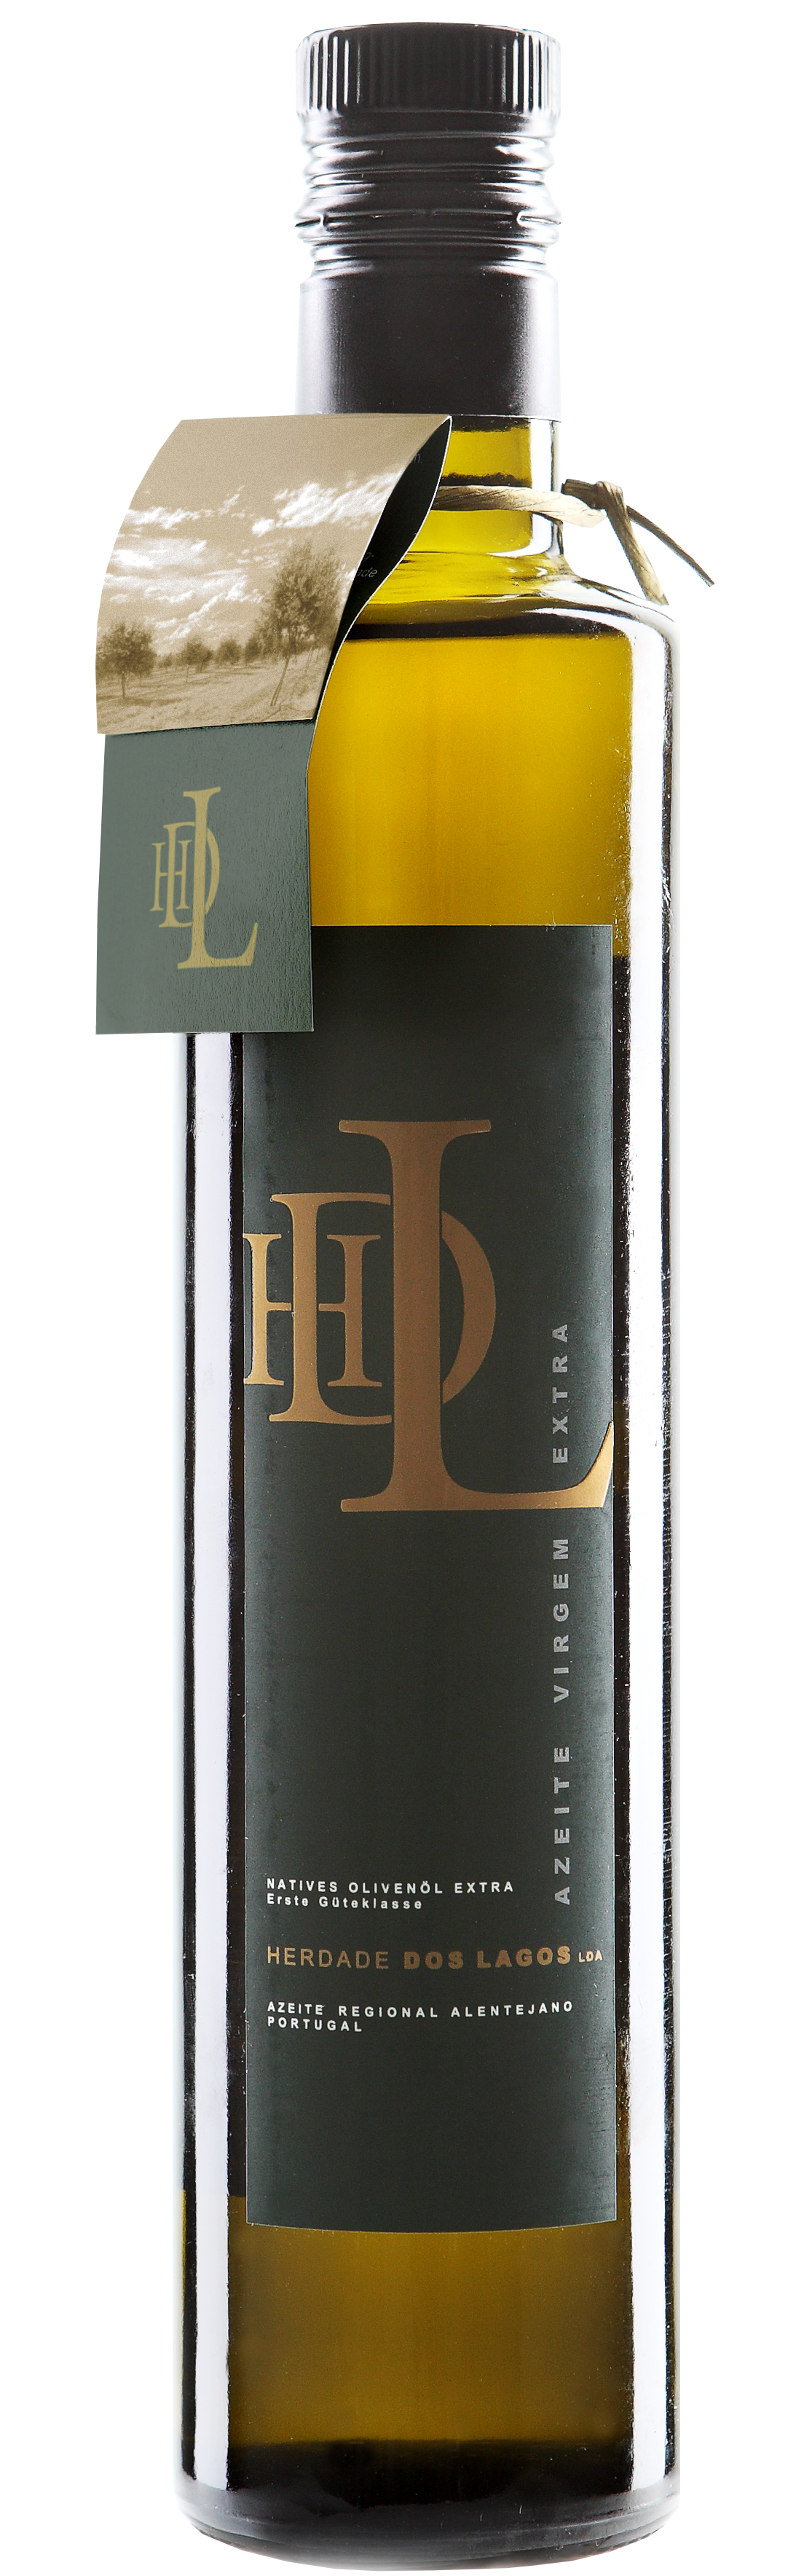 HDL Azeite Virgem Extra 0,5l